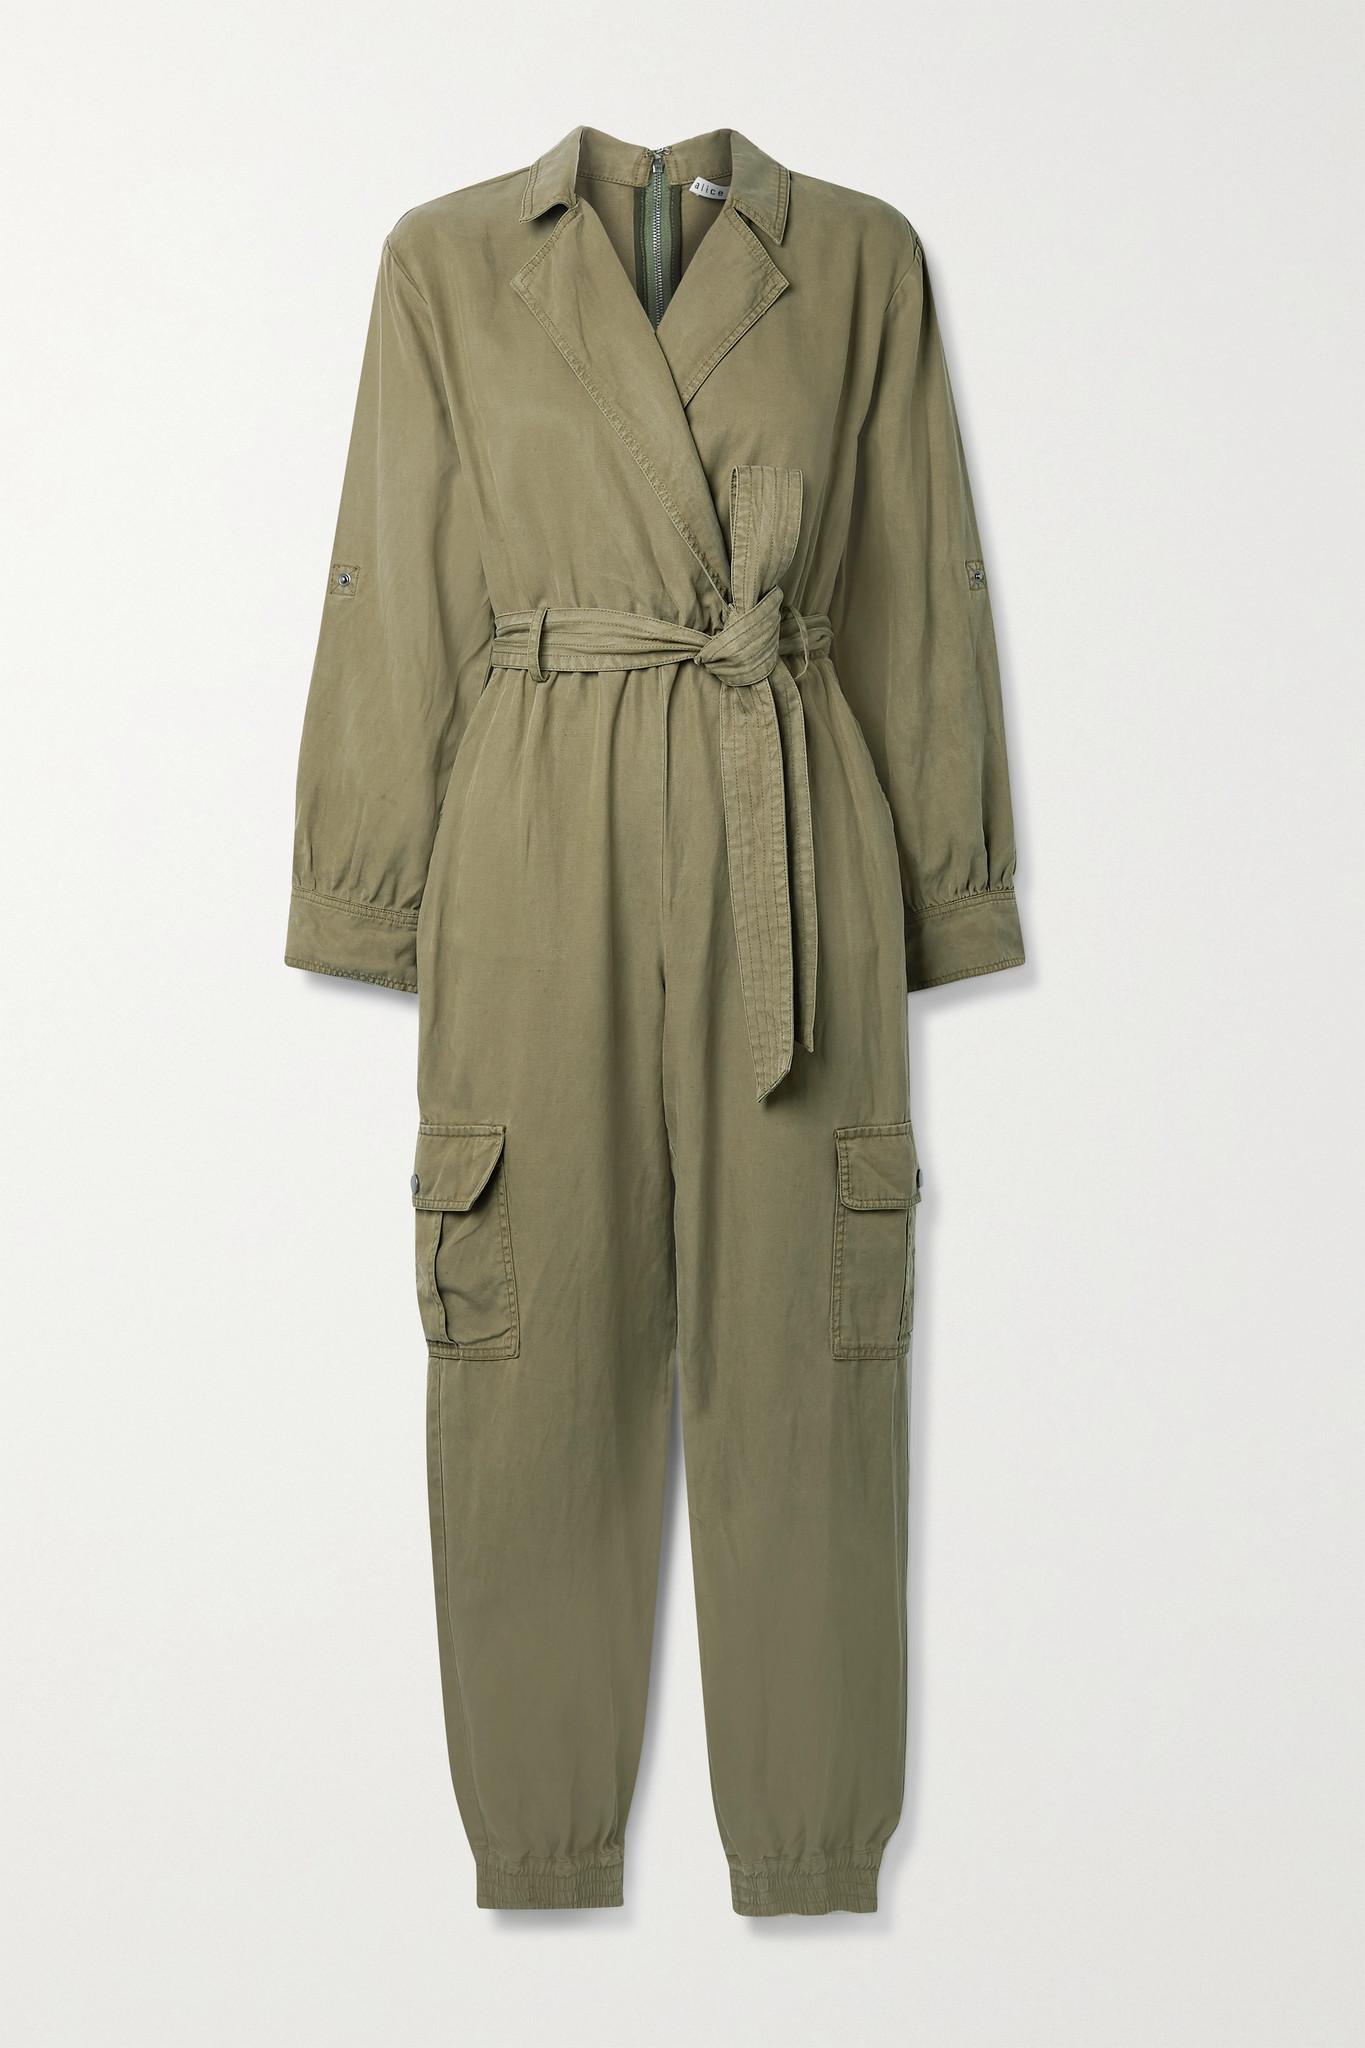 ALICE + OLIVIA - Bessie 天丝莱赛尔纤维棉麻混纺斜纹布连身裤 - 绿色 - US6